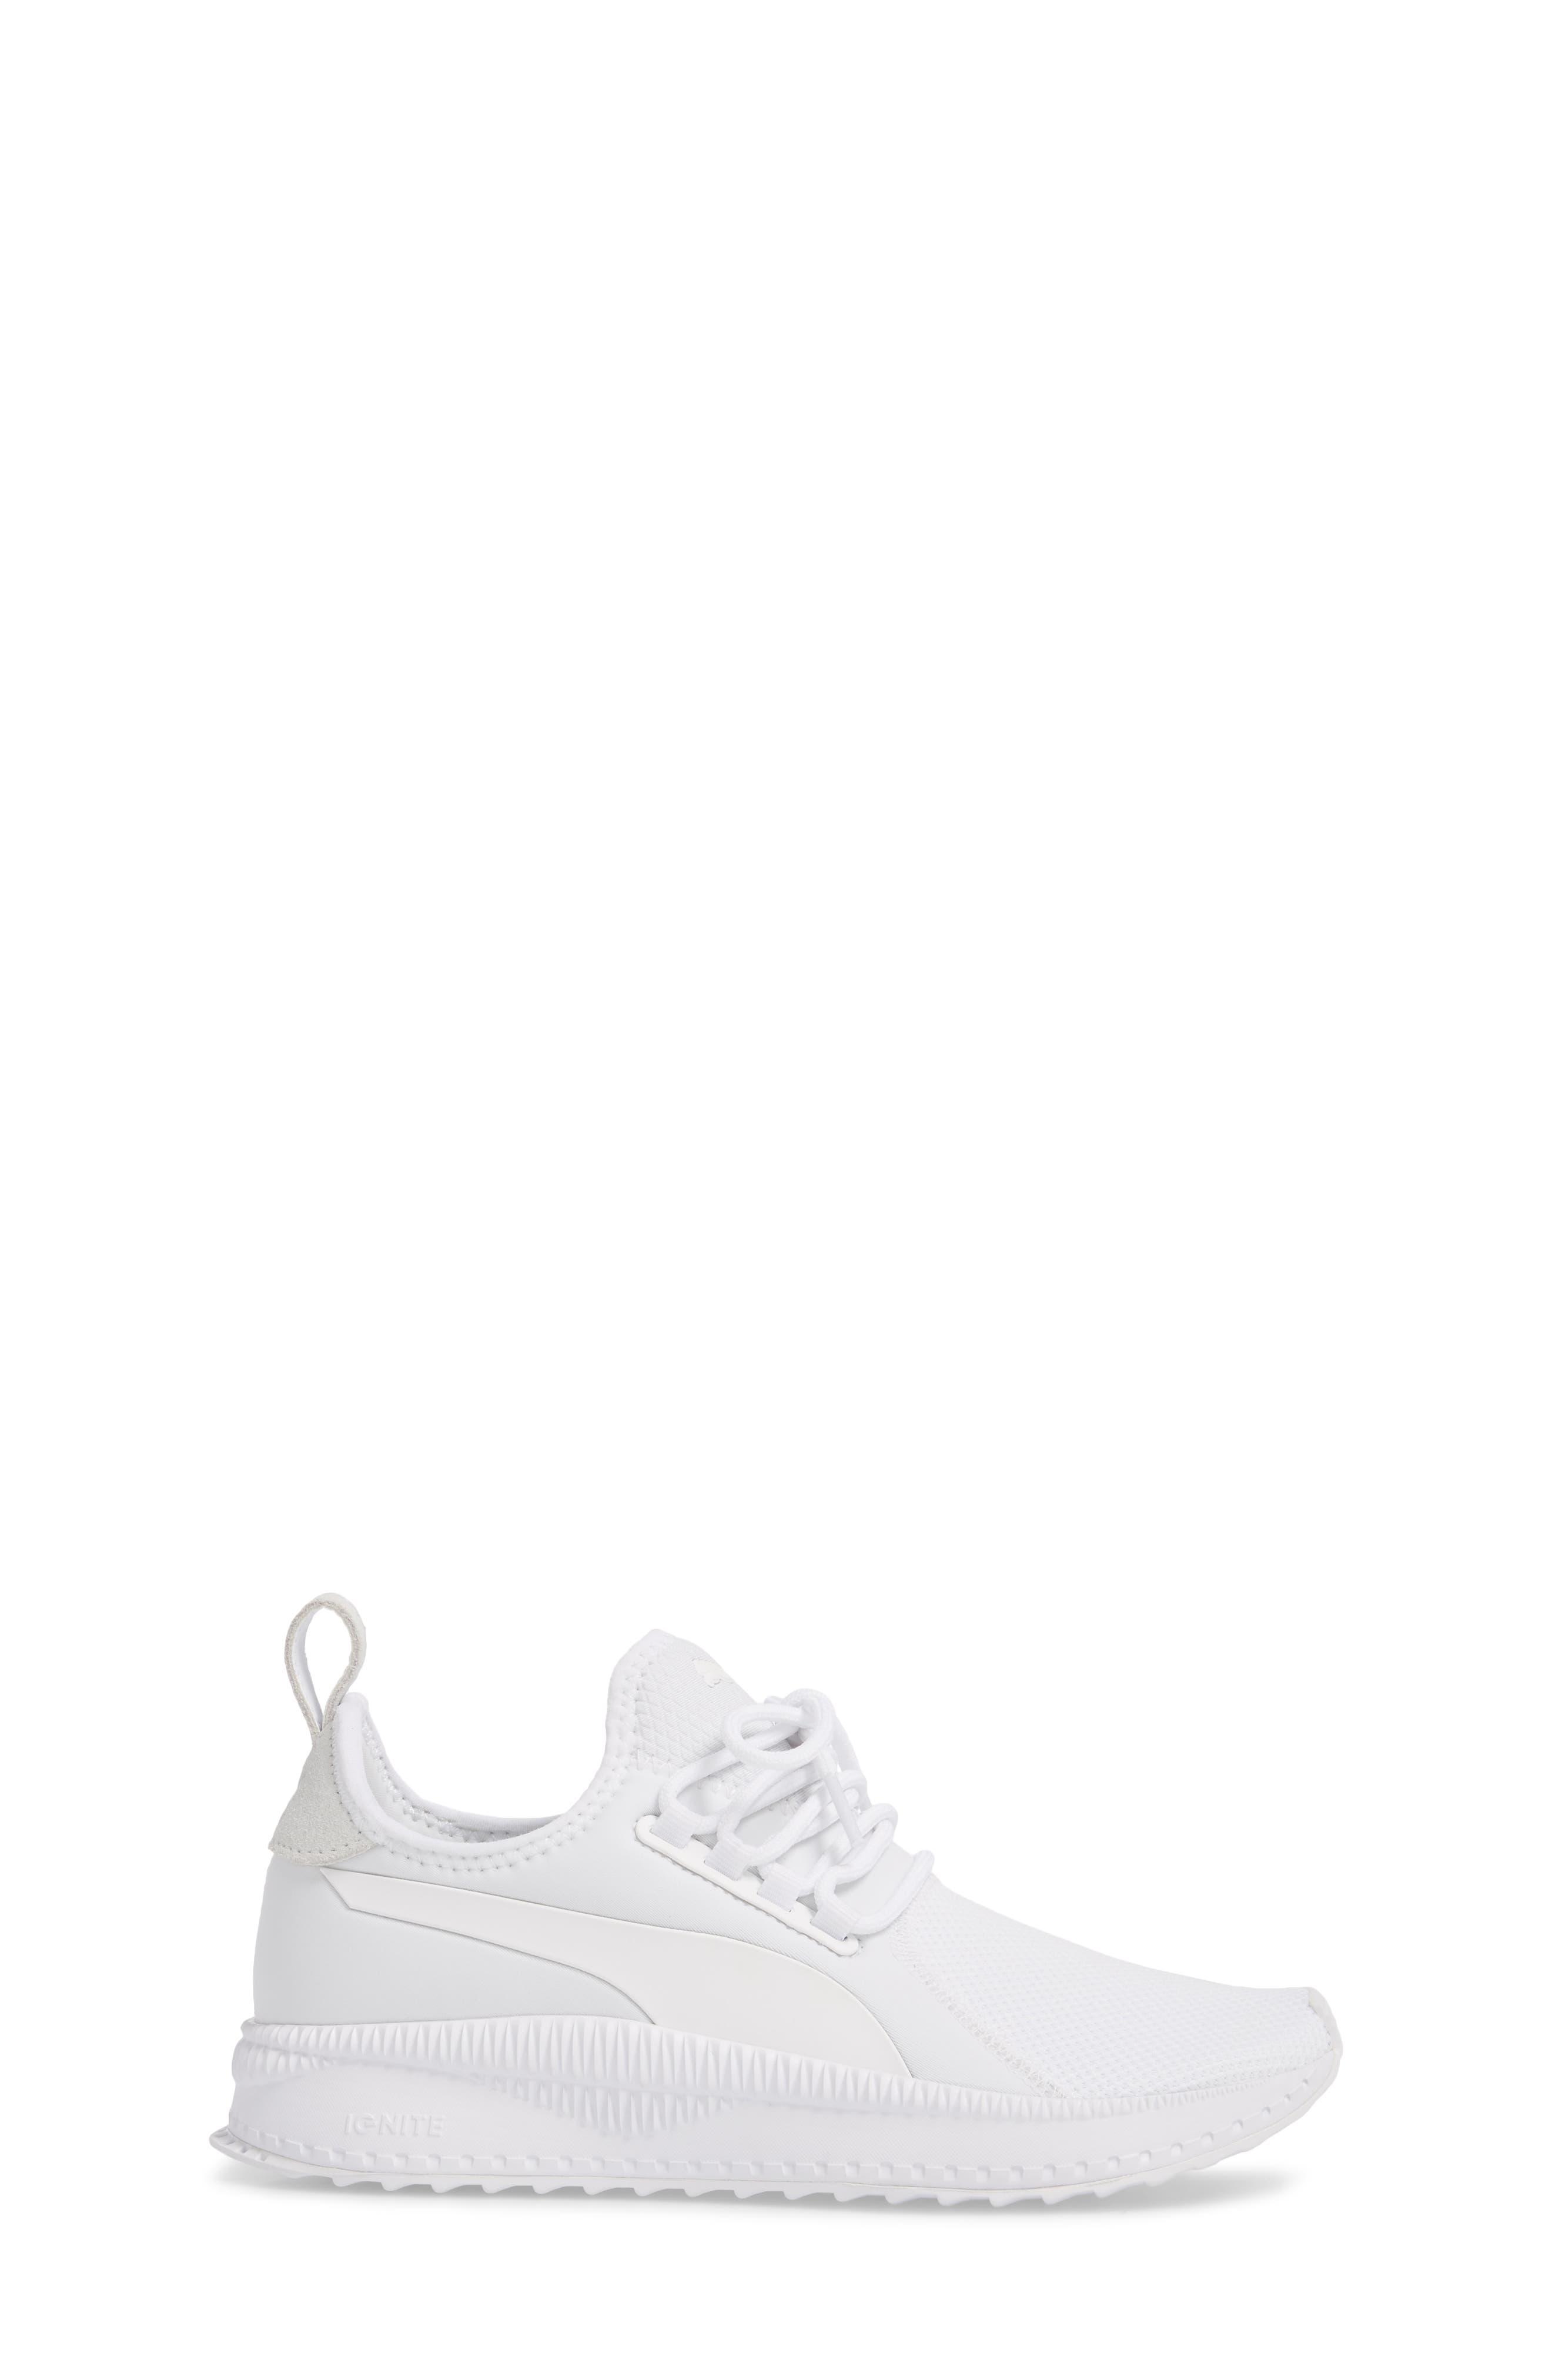 Tsugi Apex Sneaker,                             Alternate thumbnail 3, color,                             White/ White